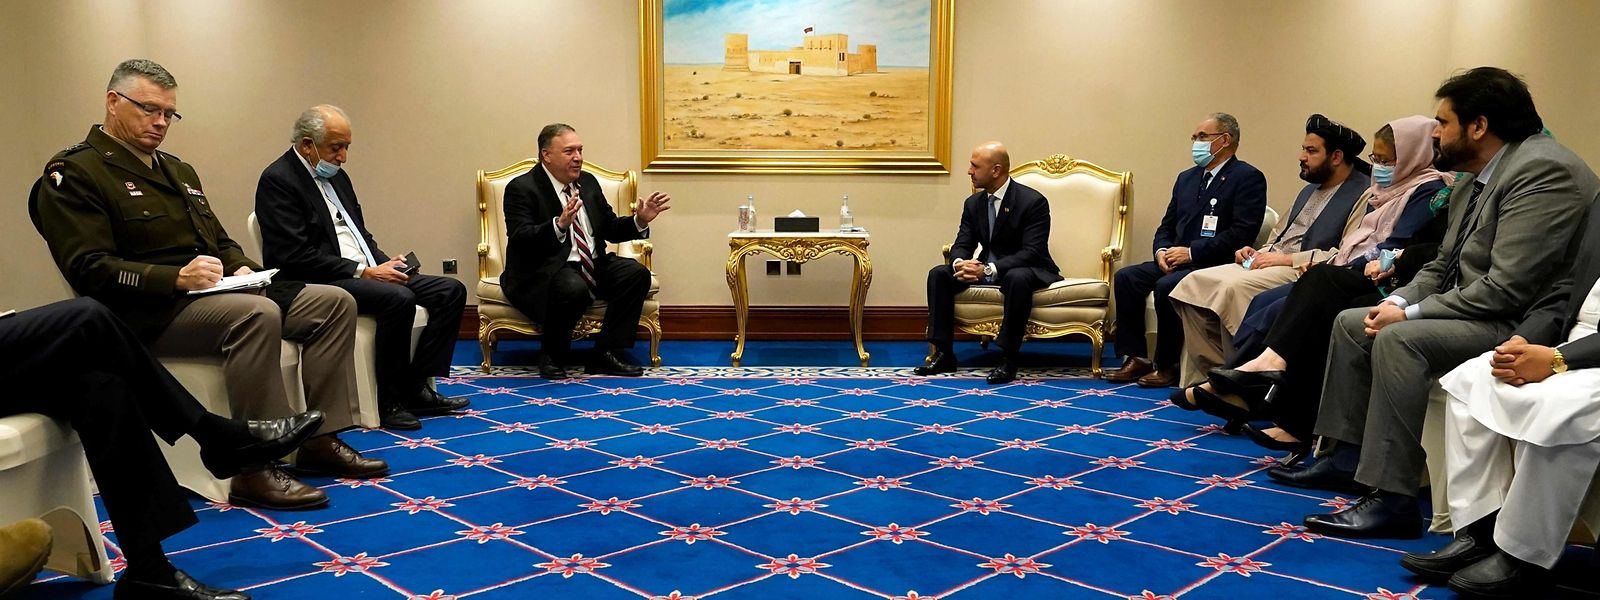 US-Außenminister Mike Pompeo trifft sich mit Afghanistans Friedensminister Sayed Sadat Mansoor Naderi.